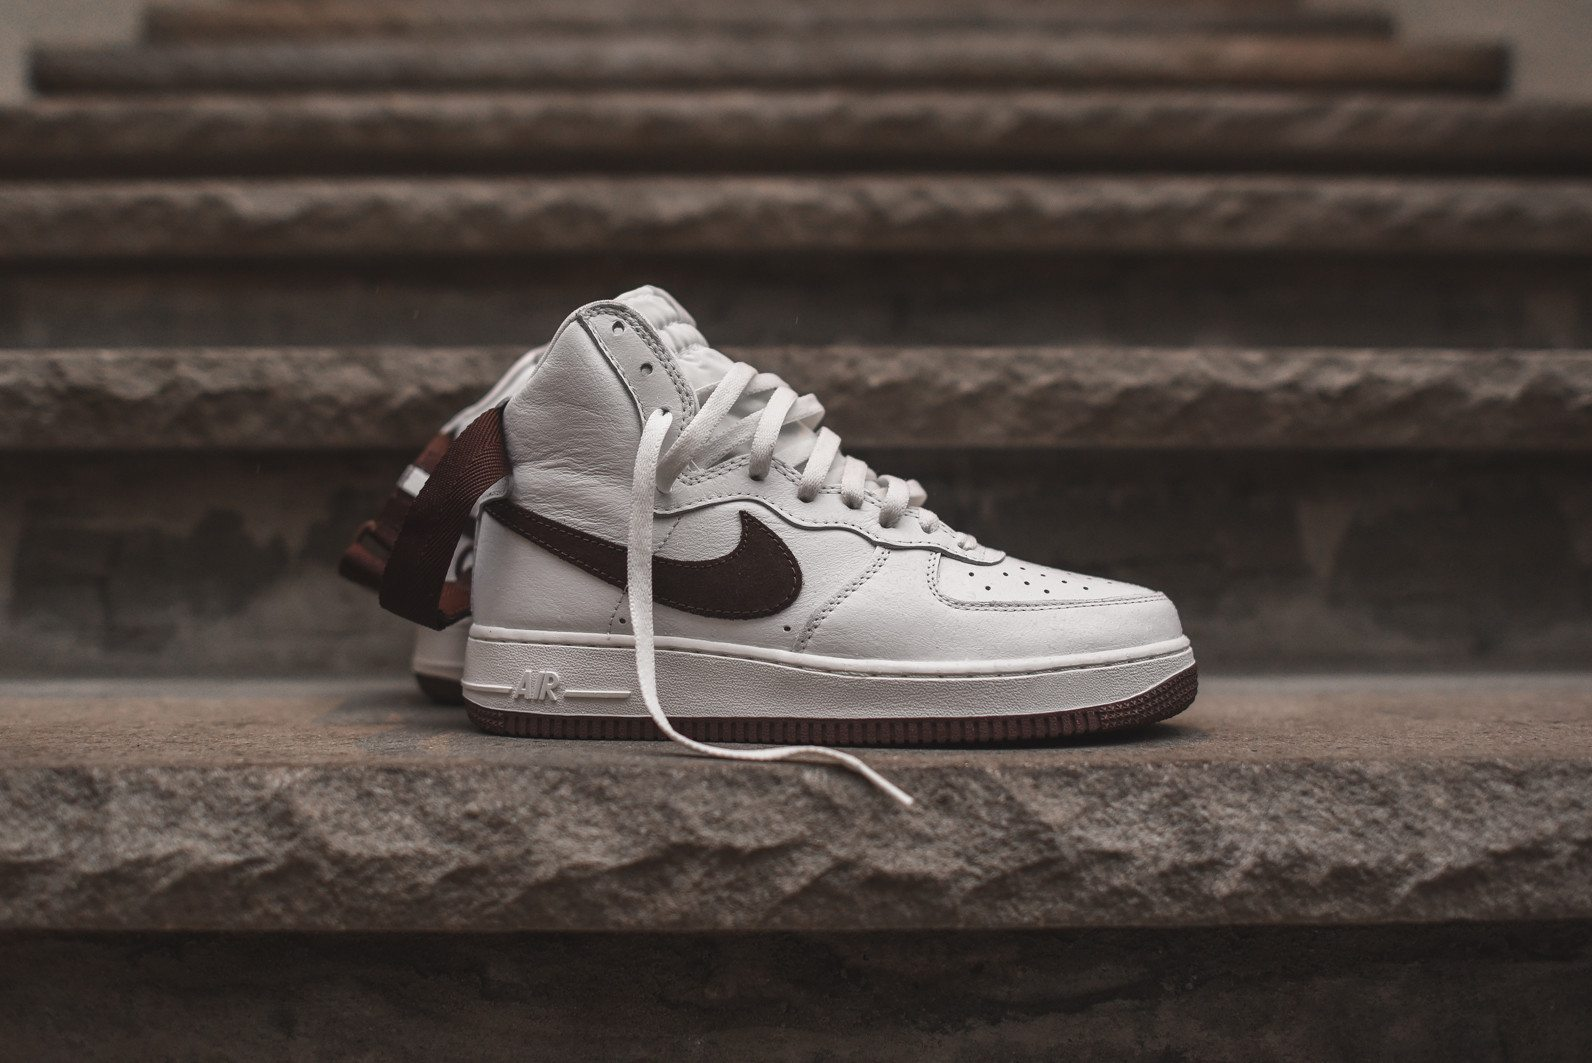 Nike Air Force 1 High Retro Summit White Chocolate 1